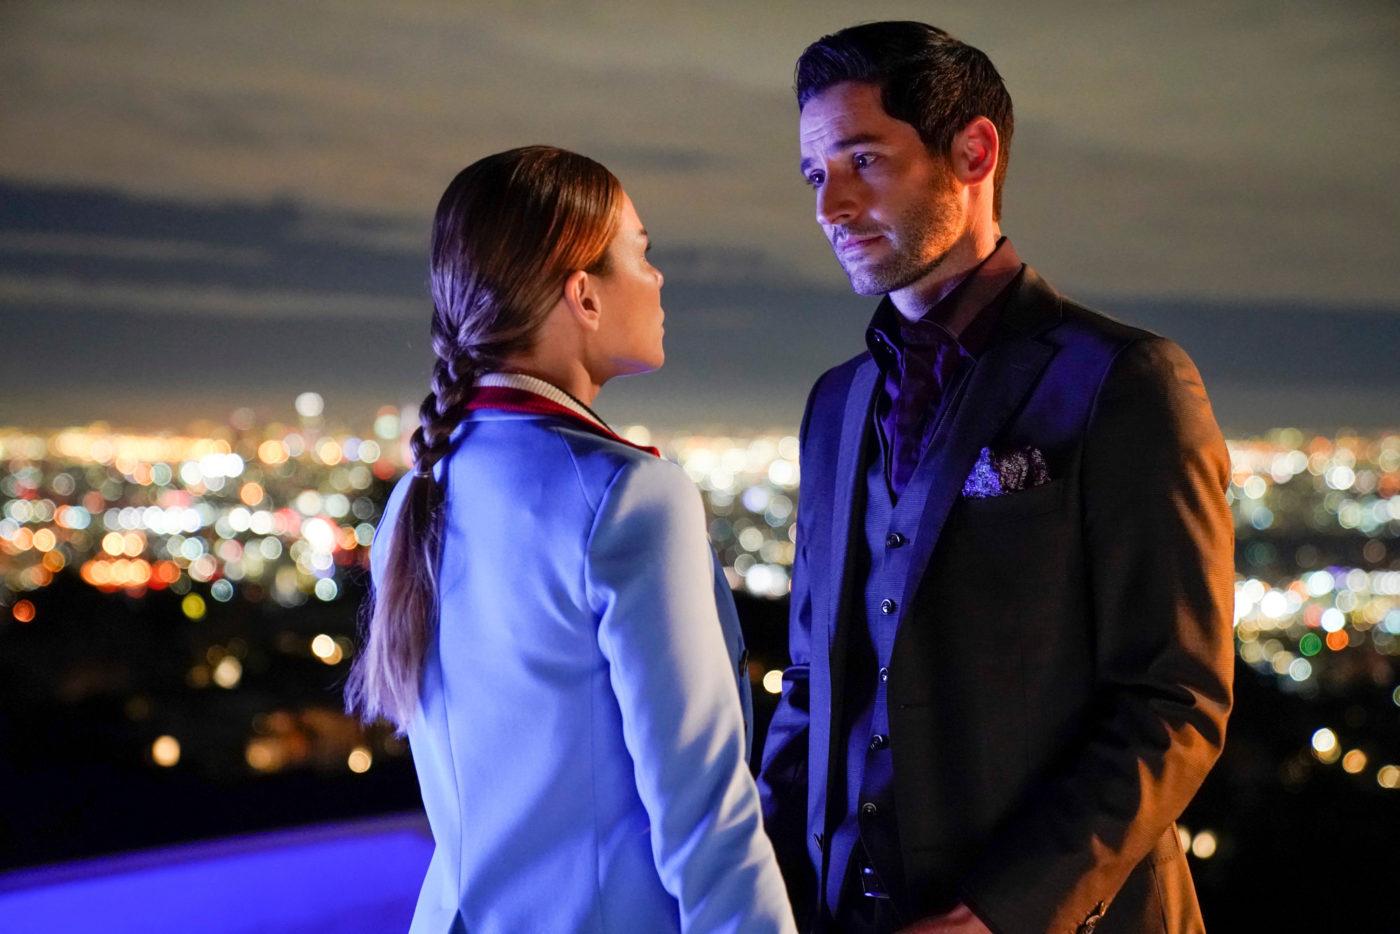 Season 6 cast adds Merrin Dungey and Brianna Hildebrand — Lucifer